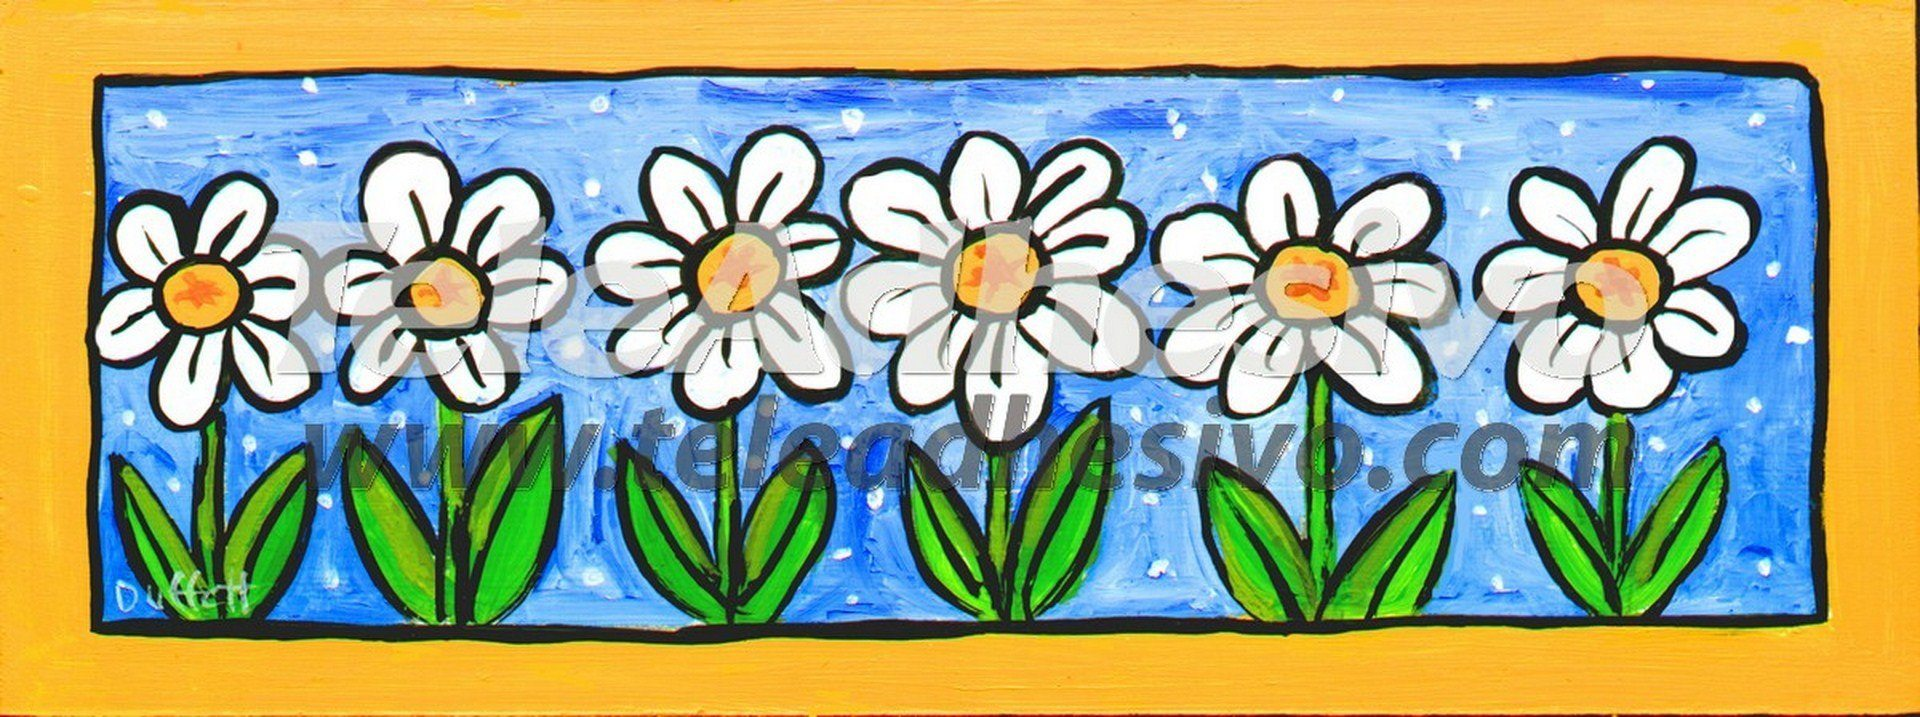 Fototapeten: Blumen